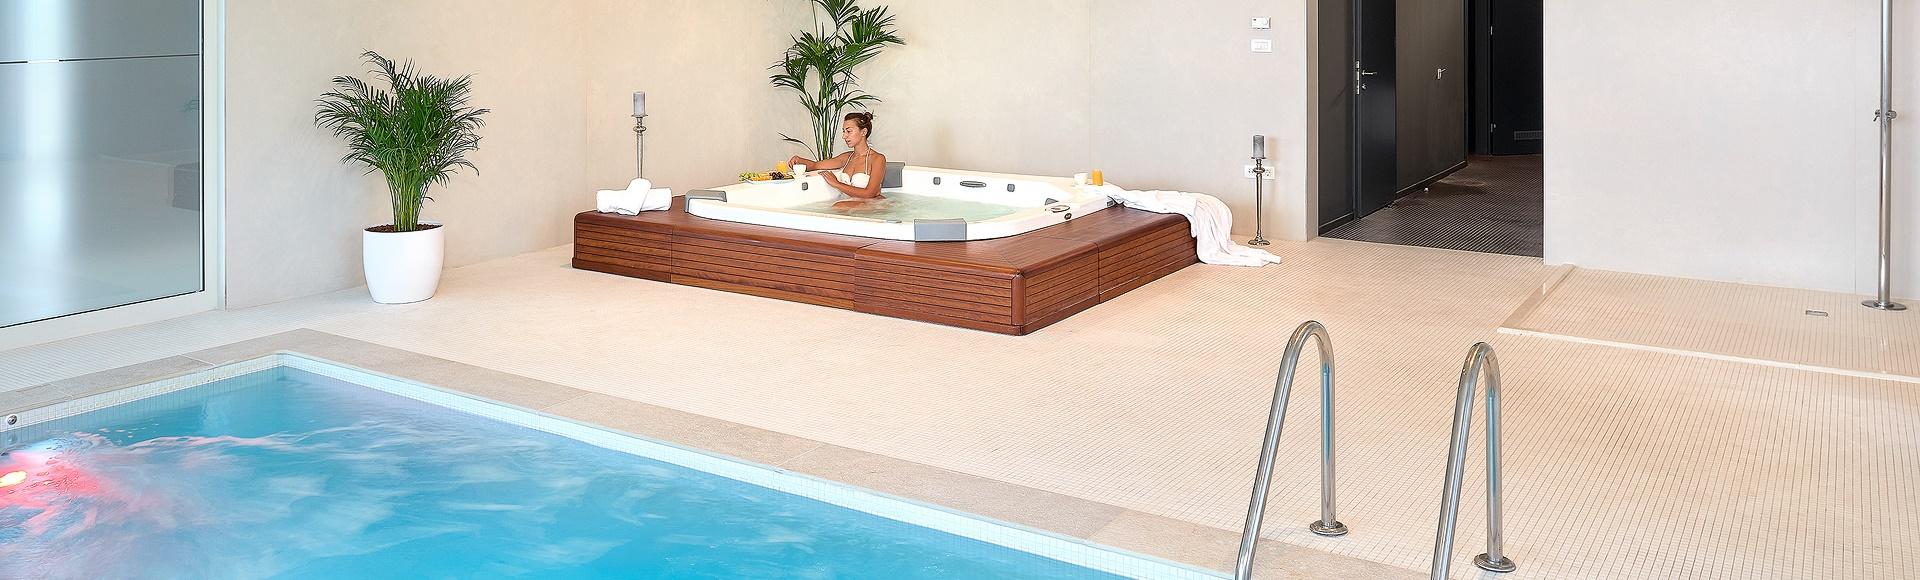 Thermae Salonae wellness & spa